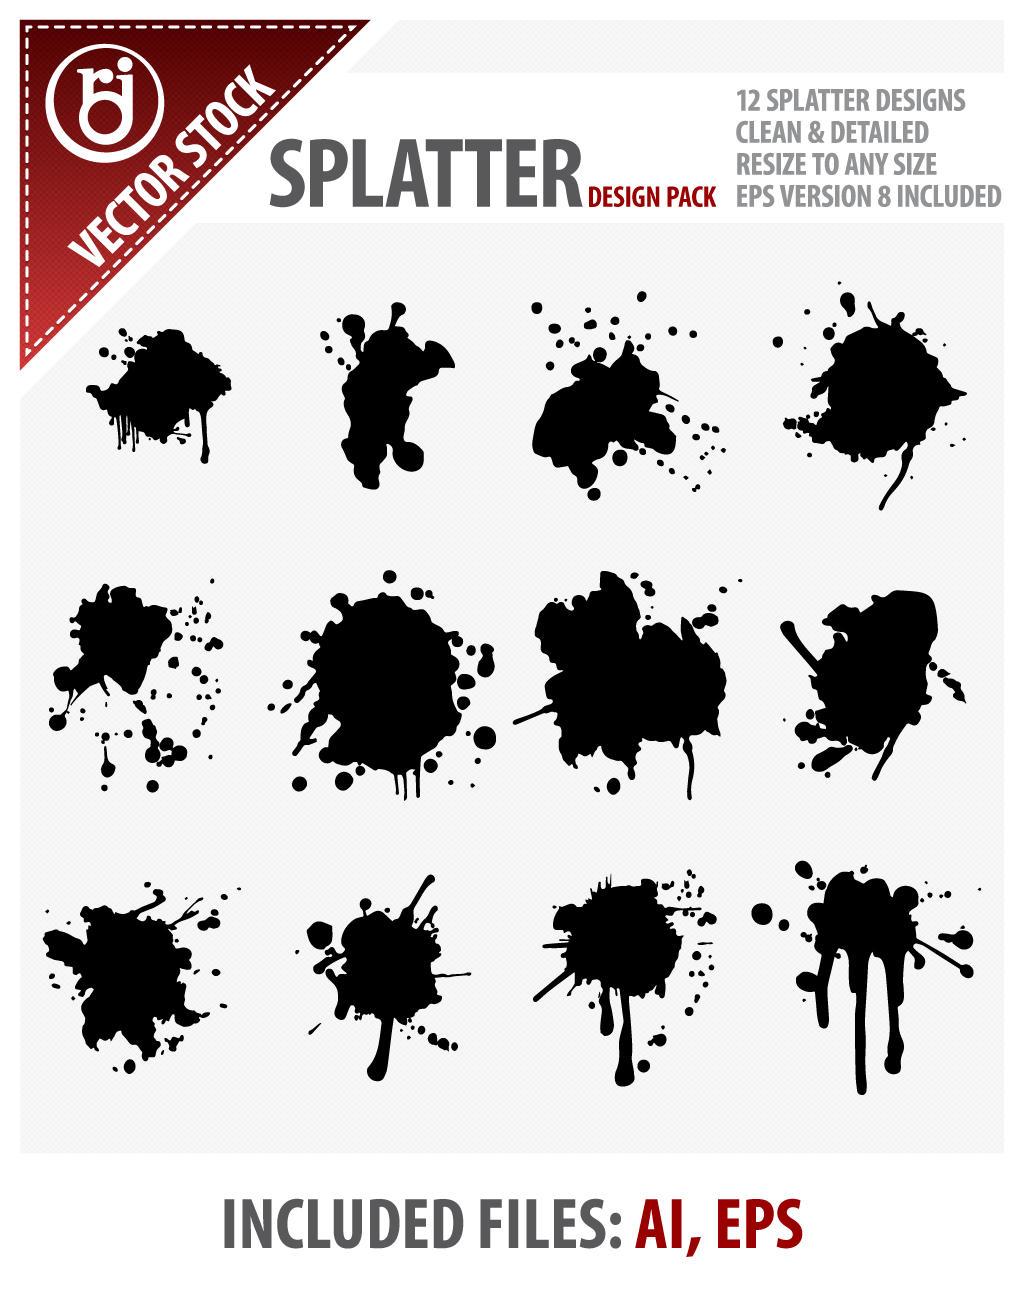 Splatter Design Pack by rjDezigns